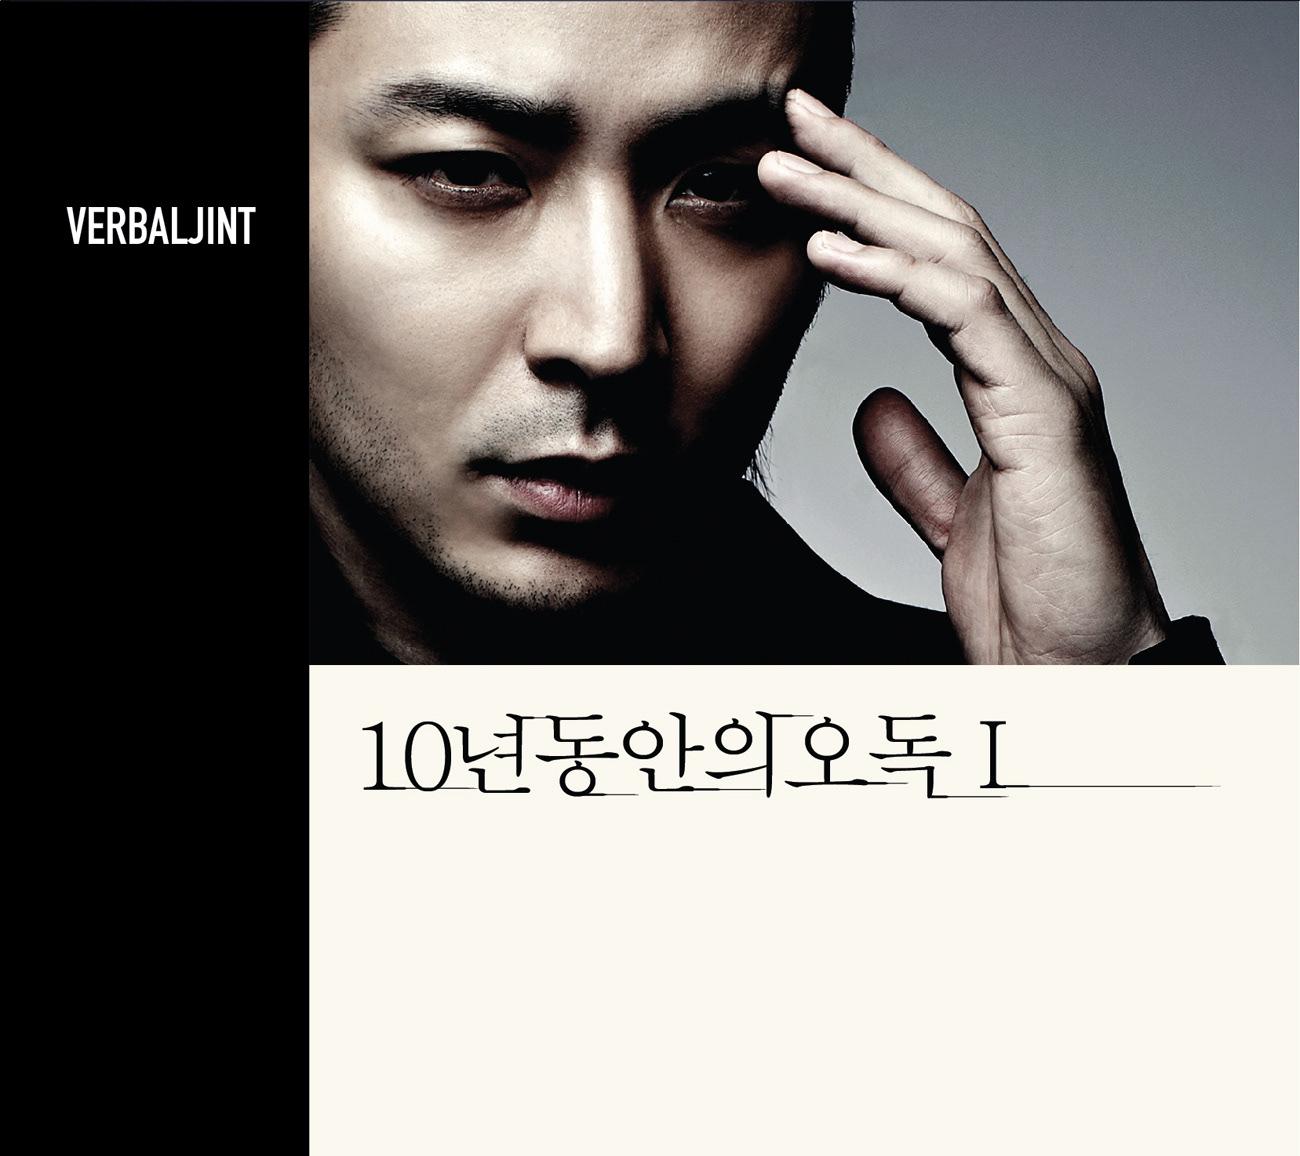 hyunjin lee - Album Cover - VERBALJINT :10 Years of Misinterpretation